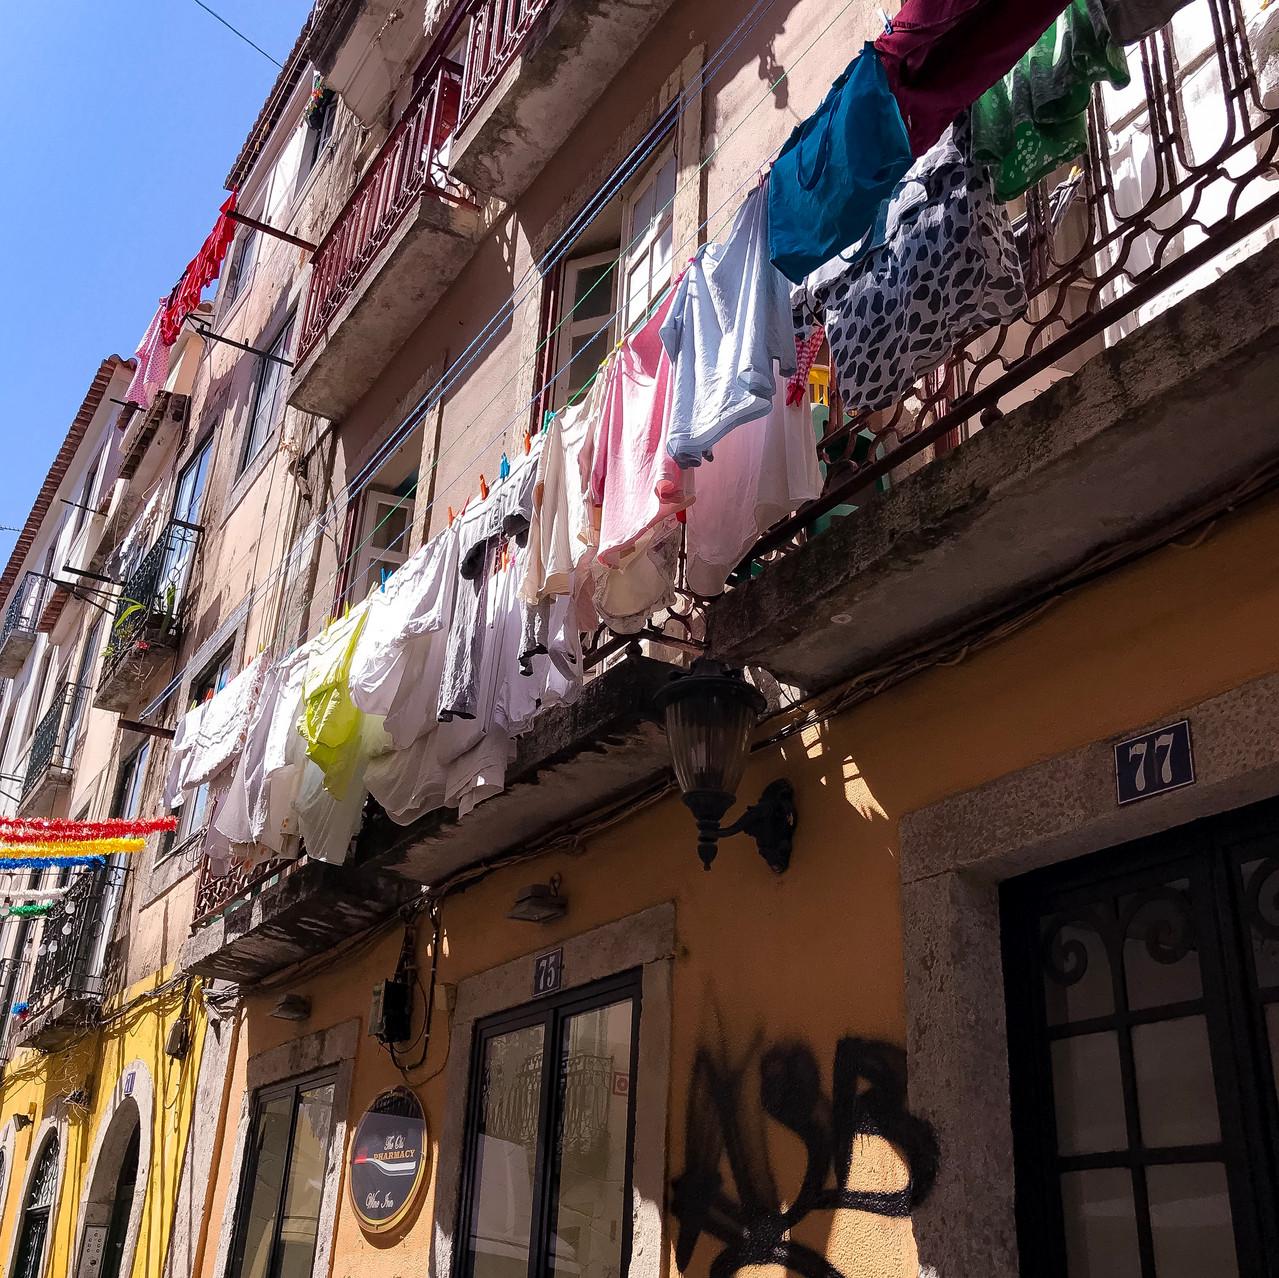 Laundry hanging - Bairro Alto